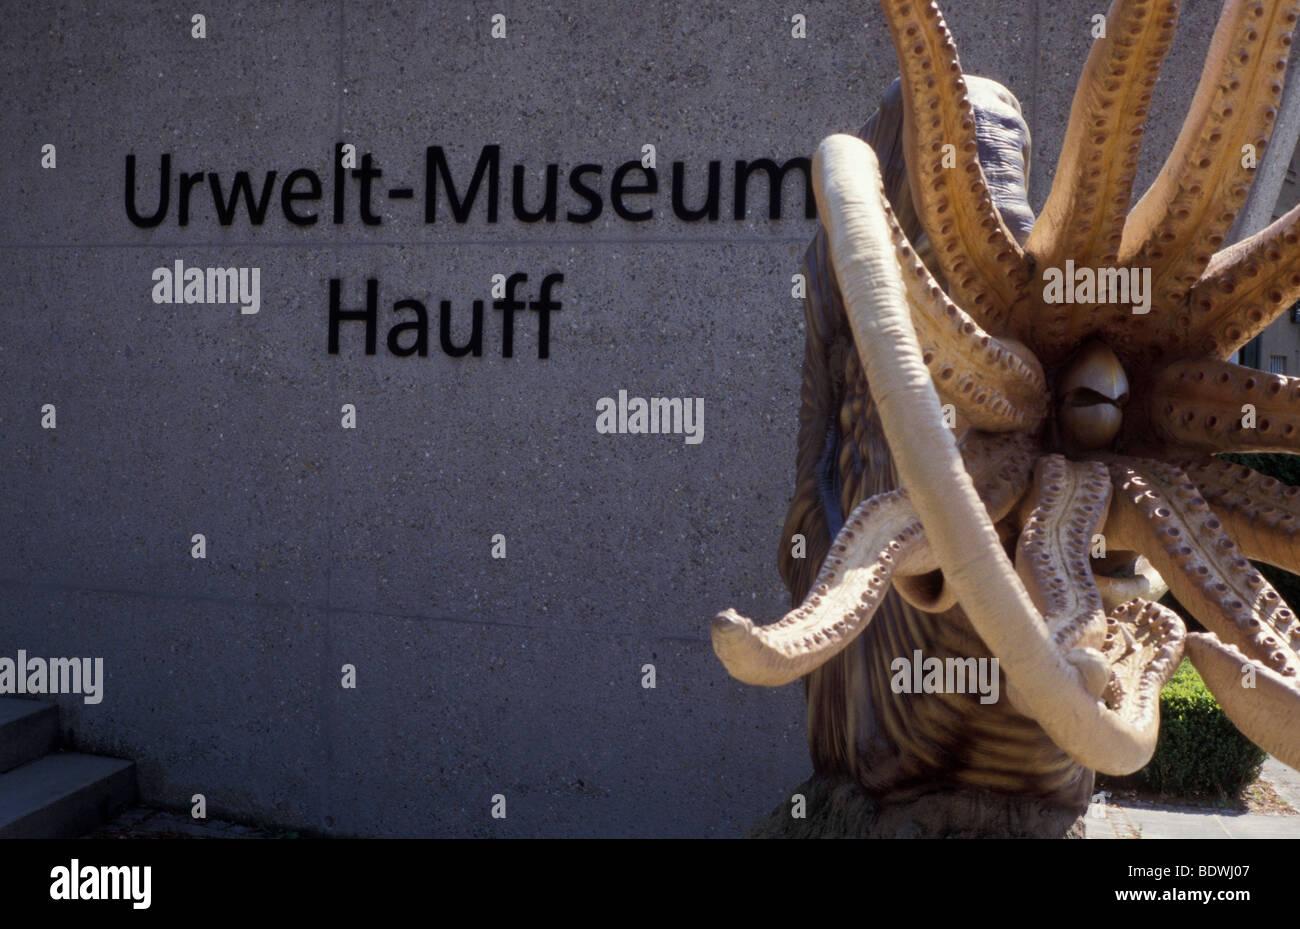 Umwelt Museum Hauff Holzmaden Germany - Stock Image